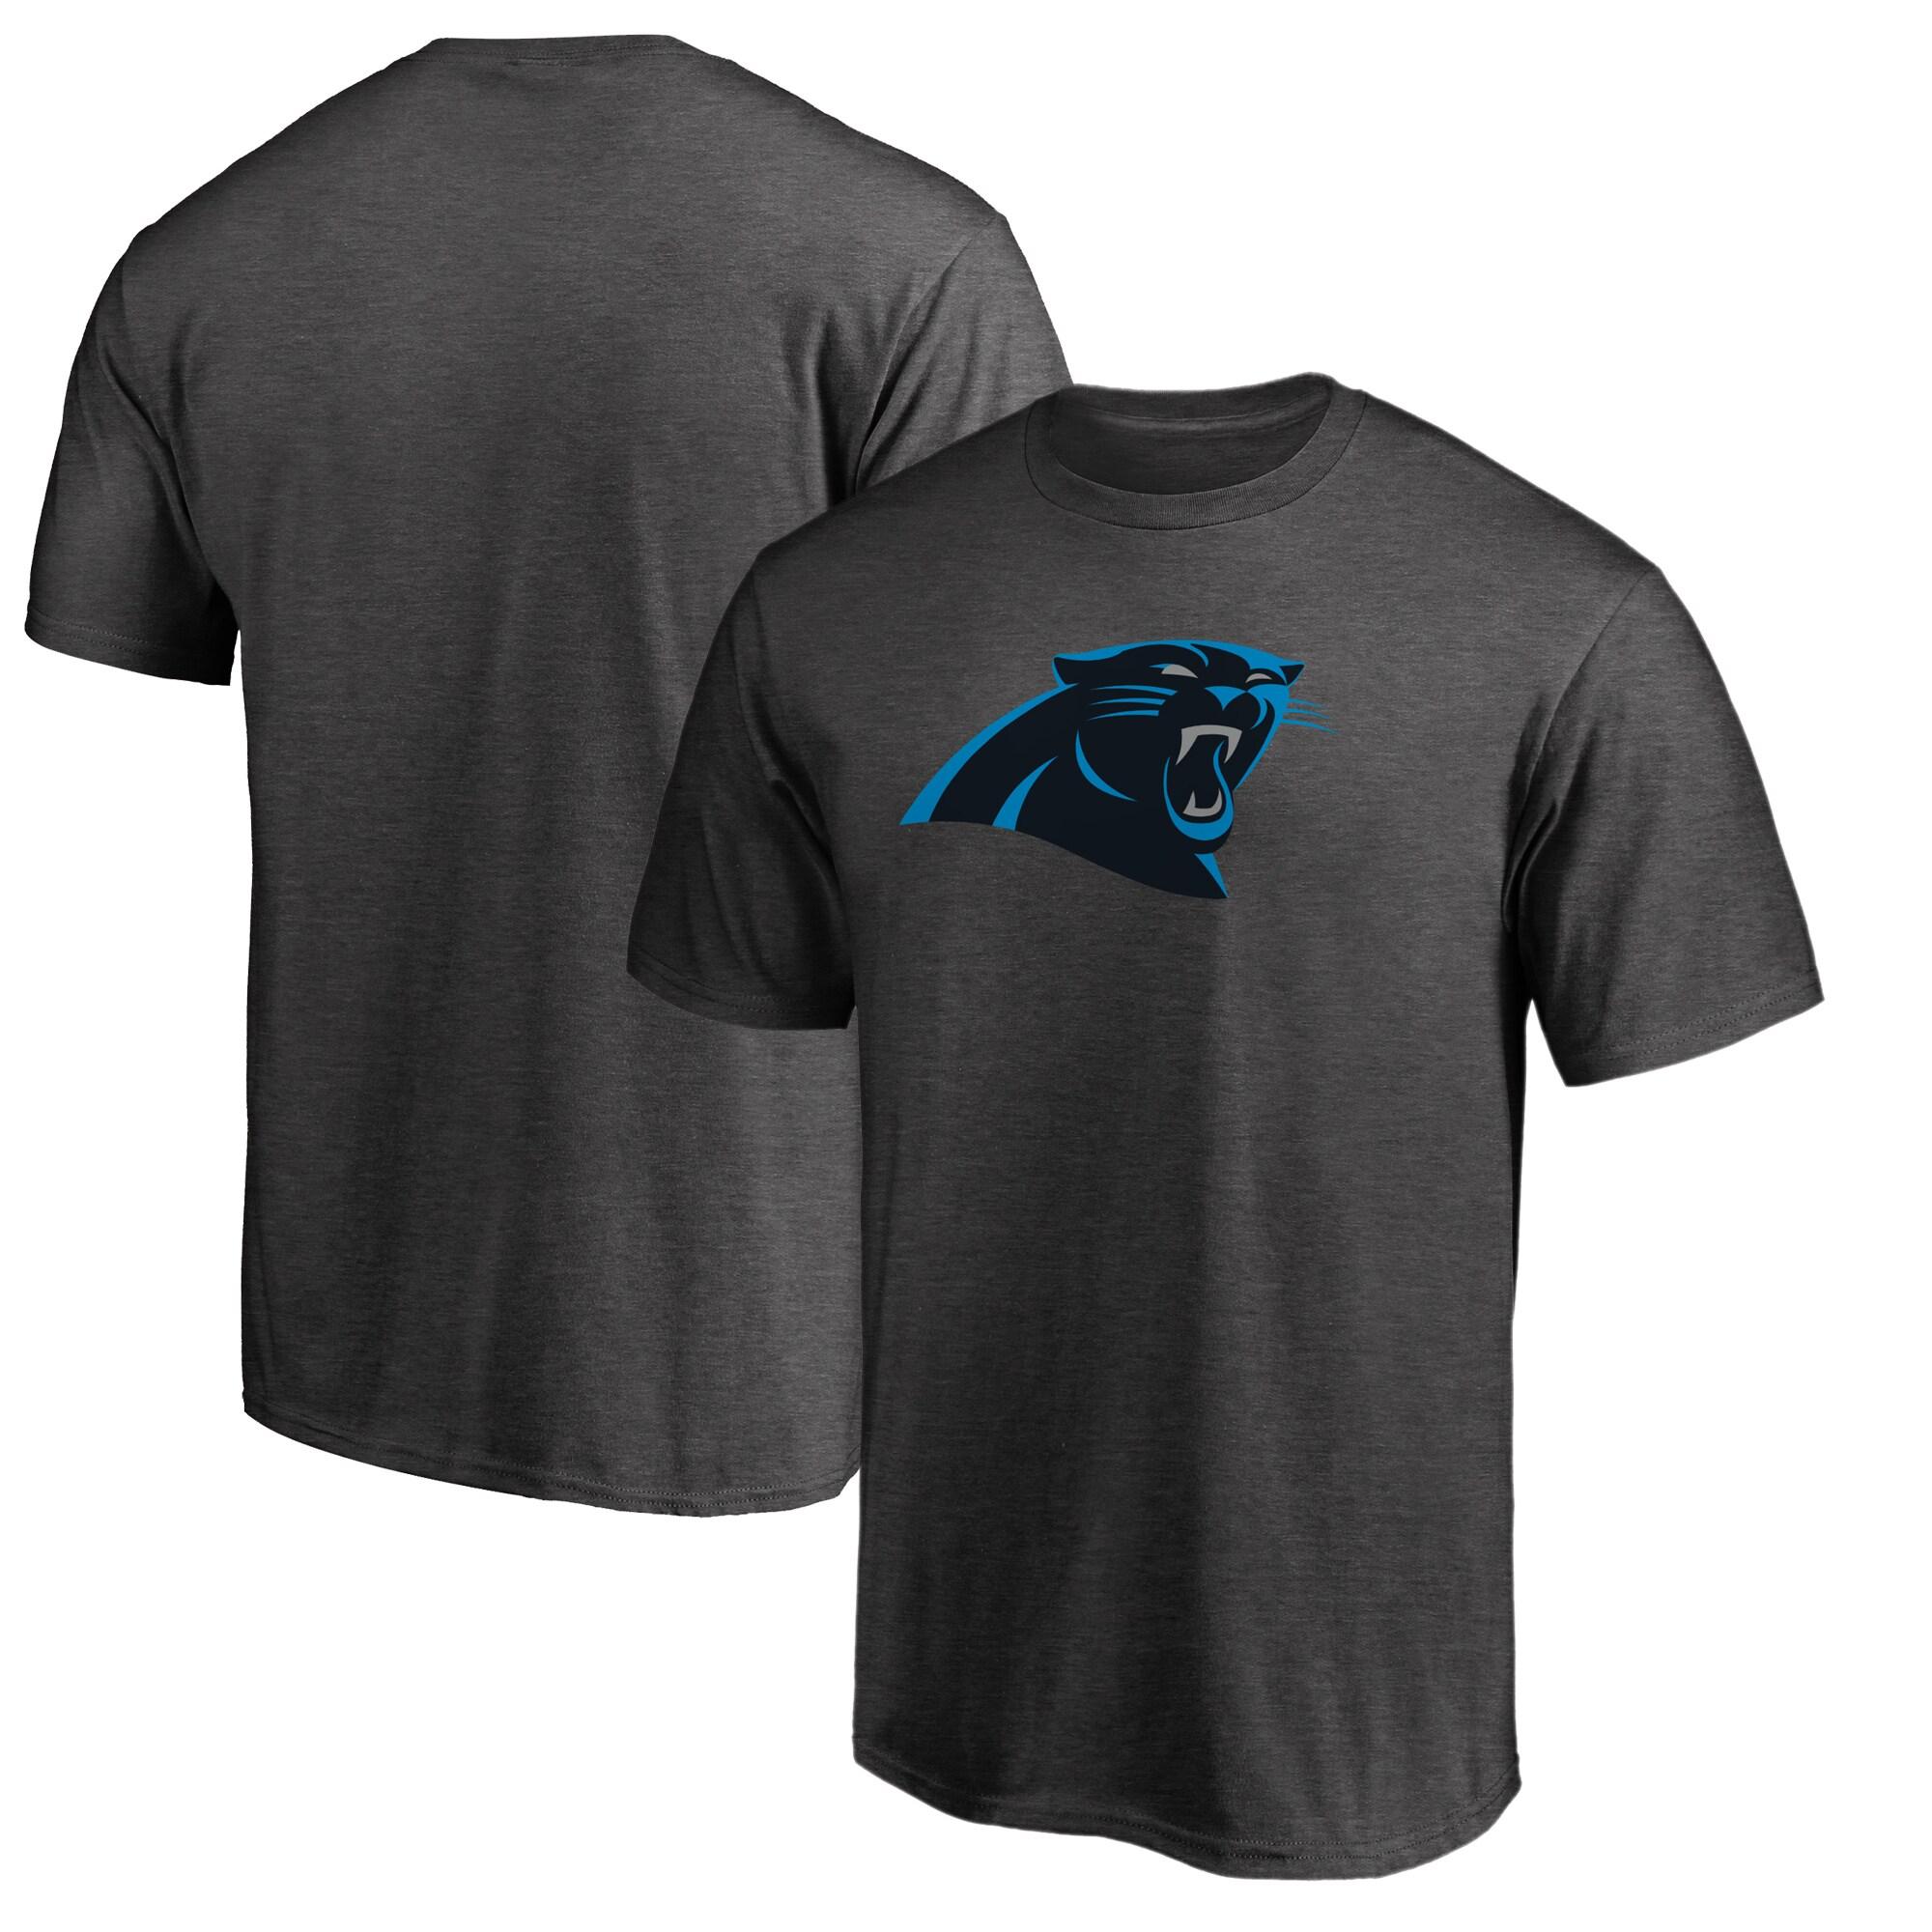 Carolina Panthers NFL Pro Line by Fanatics Branded Primary Logo Big & Tall T-Shirt - Heathered Gray